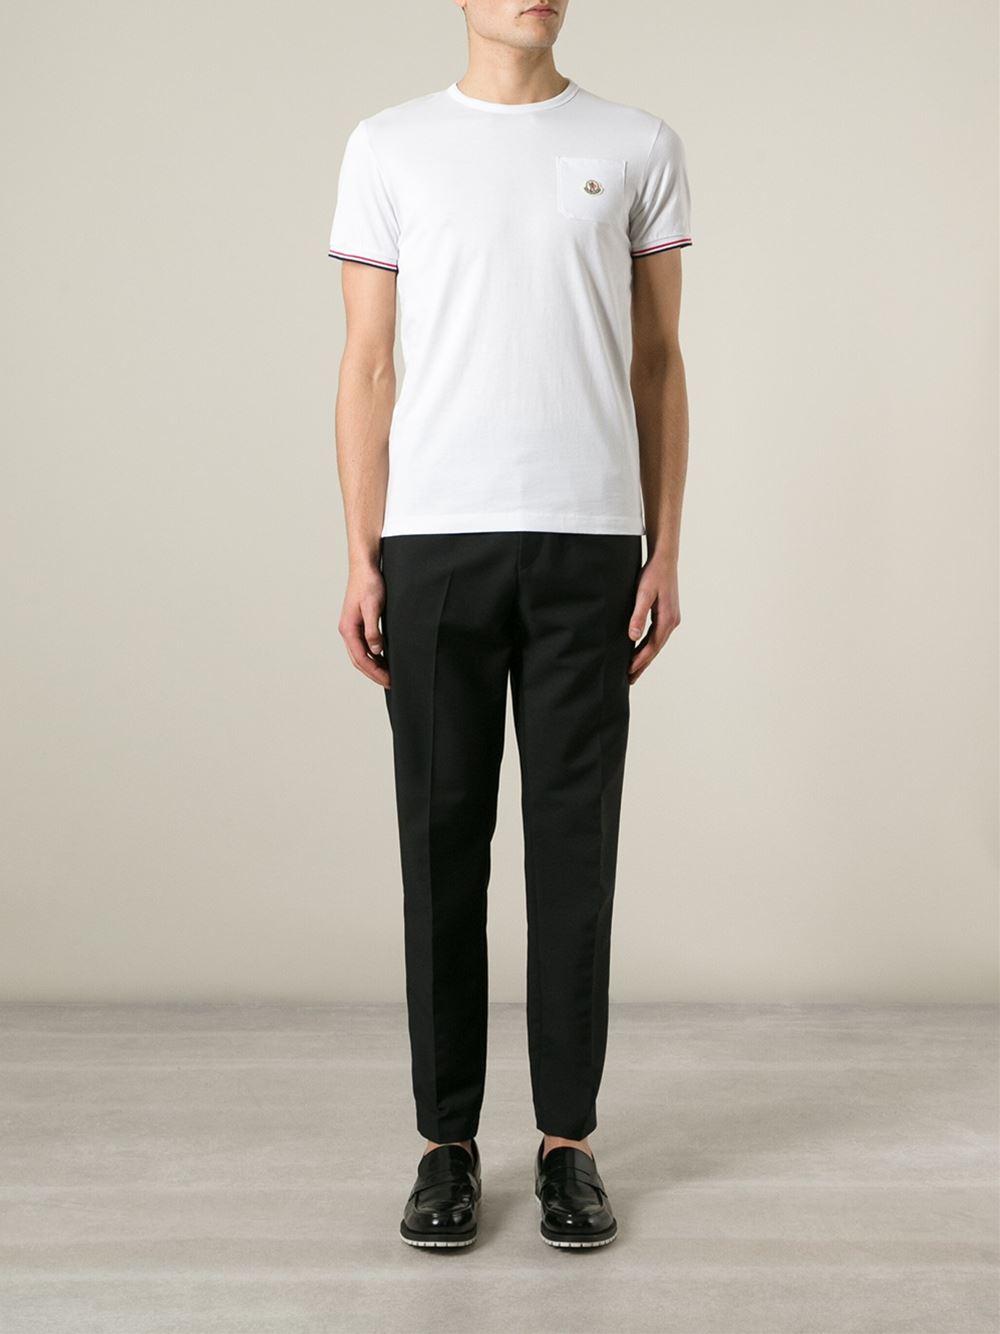 e185f55f5 Moncler Crew-Neck T-Shirt in White for Men - Lyst